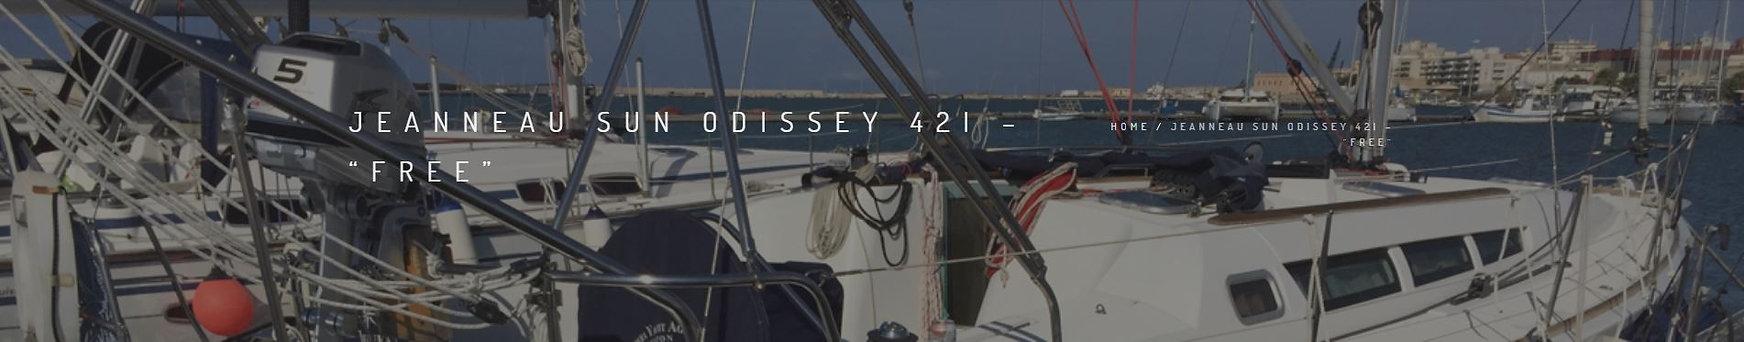 top_odissey_fr.JPG